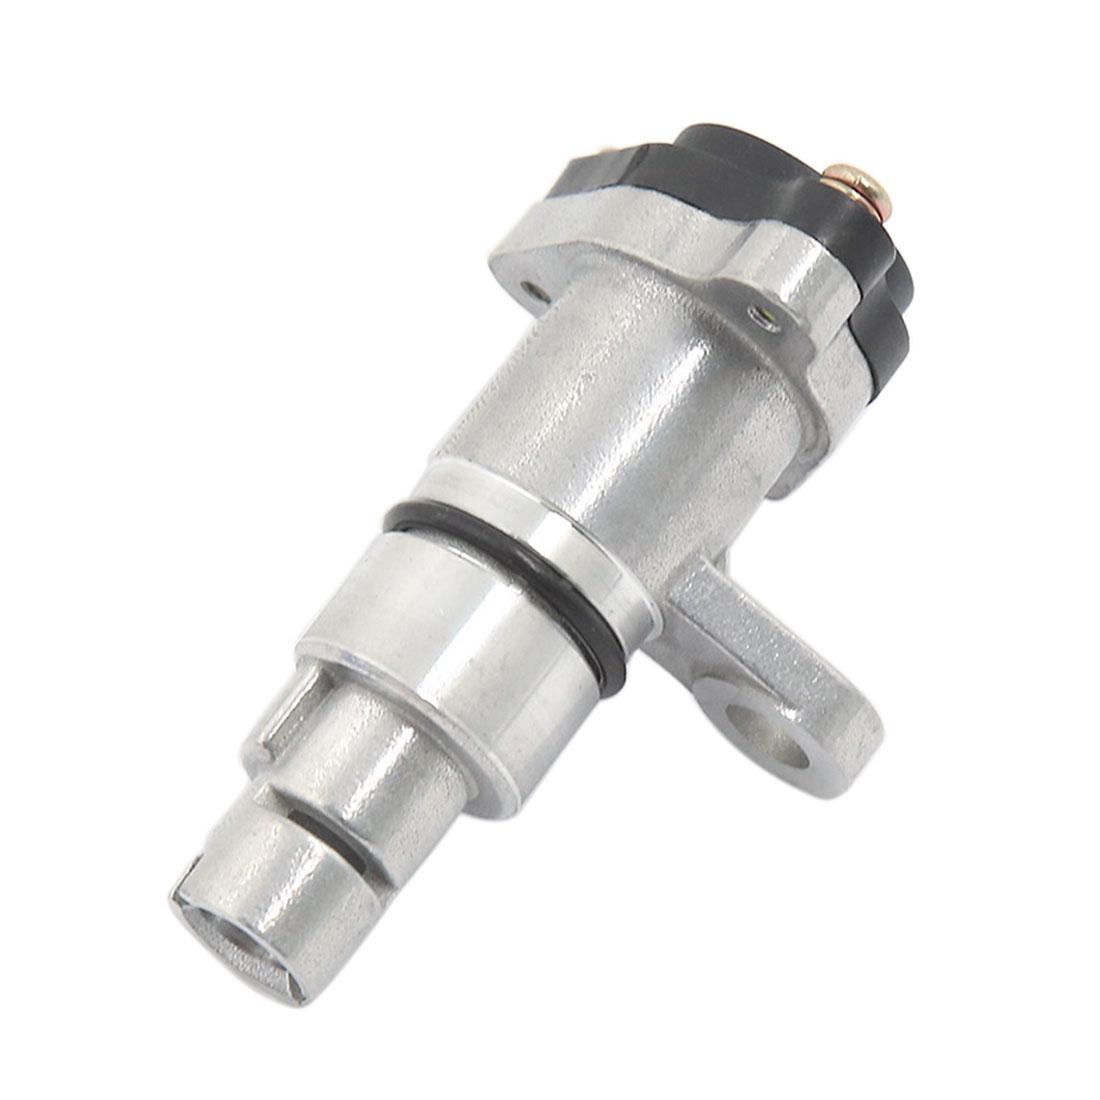 Vehicle Speed Sensor Fits Toyota 4Runner Pickup Previa 83181-35051 83181-35080